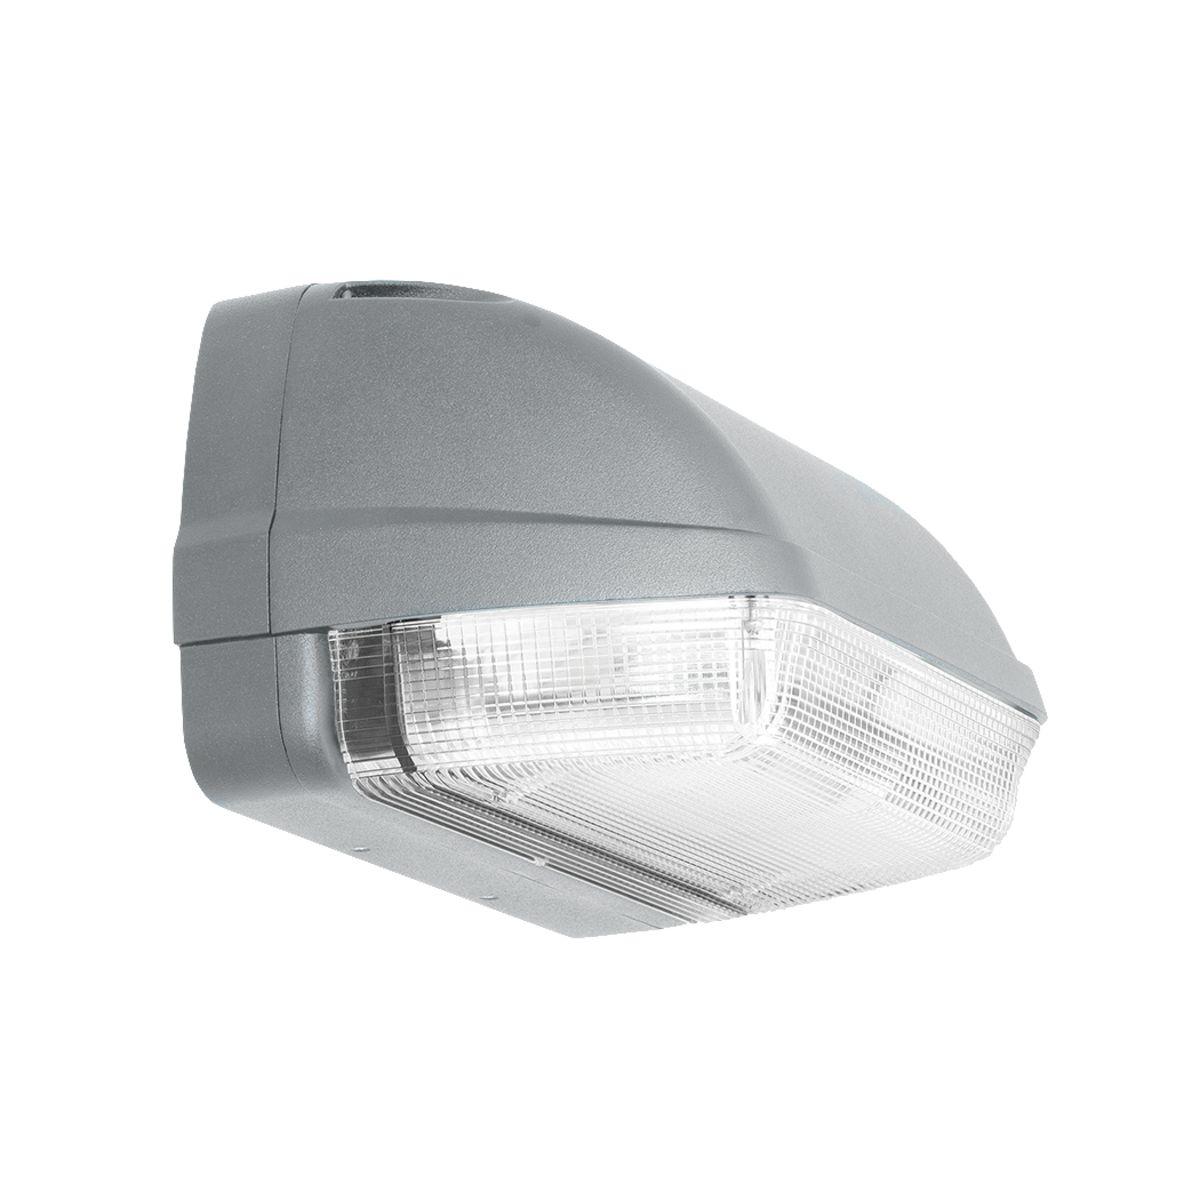 Lnc2 Litepak Wall Mount Commercial Outdoor Lighting Lighting Controls Products